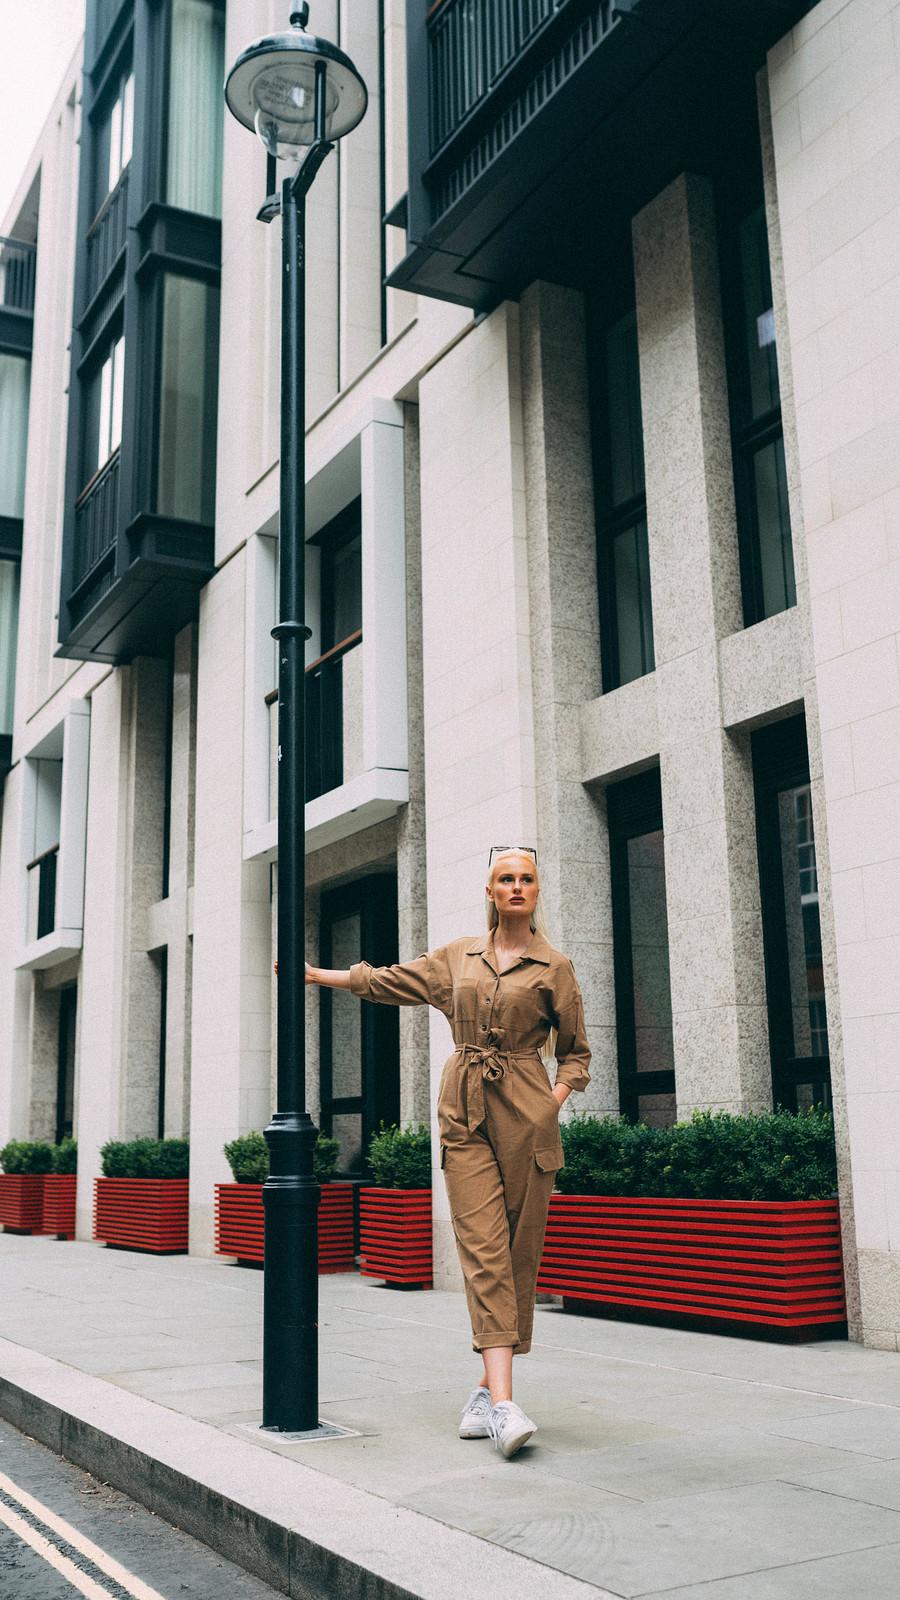 Adventuring around London / Model Summer Ellen / Uploaded 12th July 2020 @ 03:48 PM